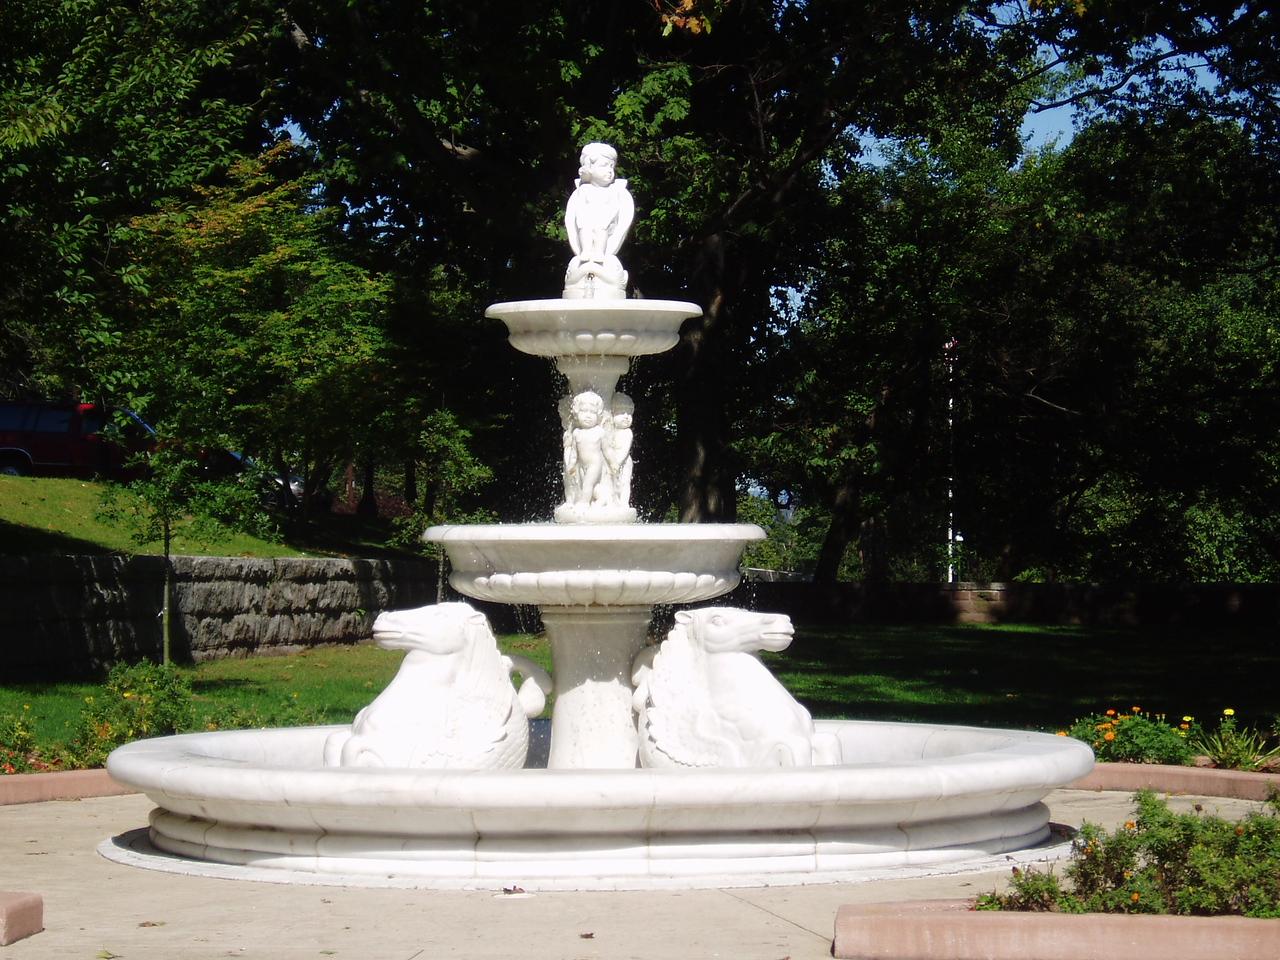 A fountain at Castle Lambert near Patterson, NJ.